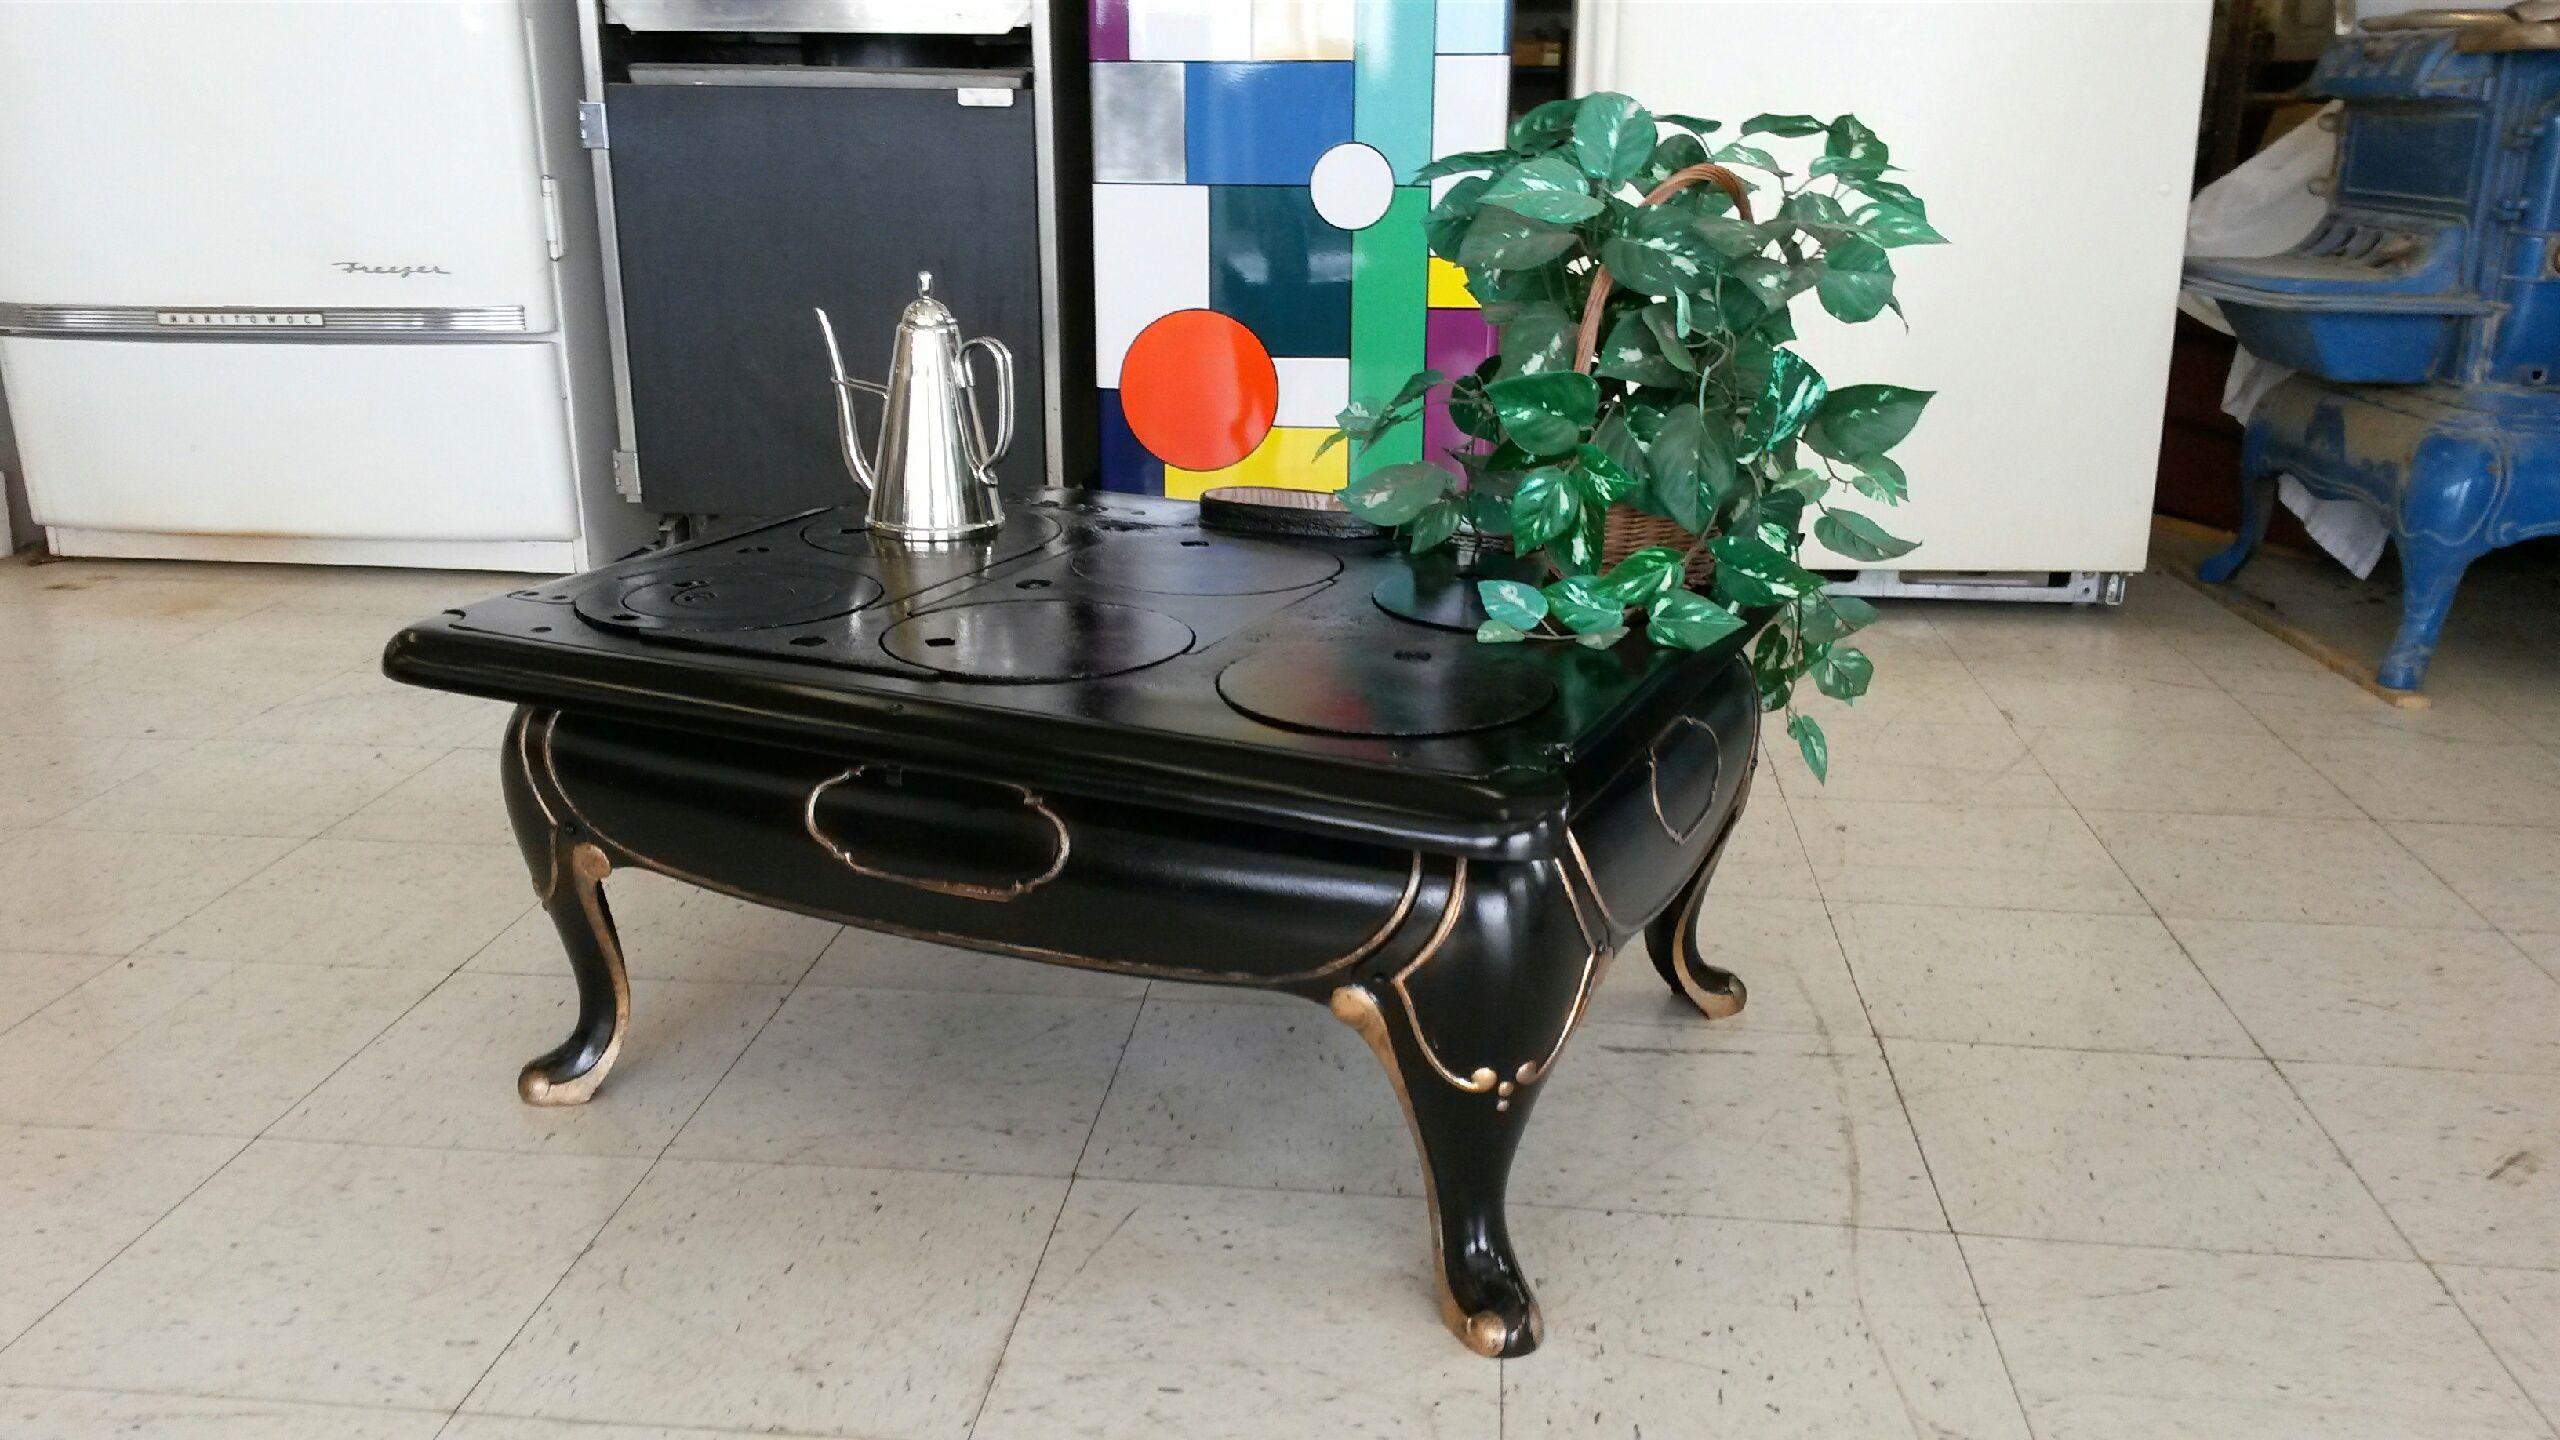 Ntl Appliance Repair Co Coffee Table Appliance Repair Iron Coffee Table